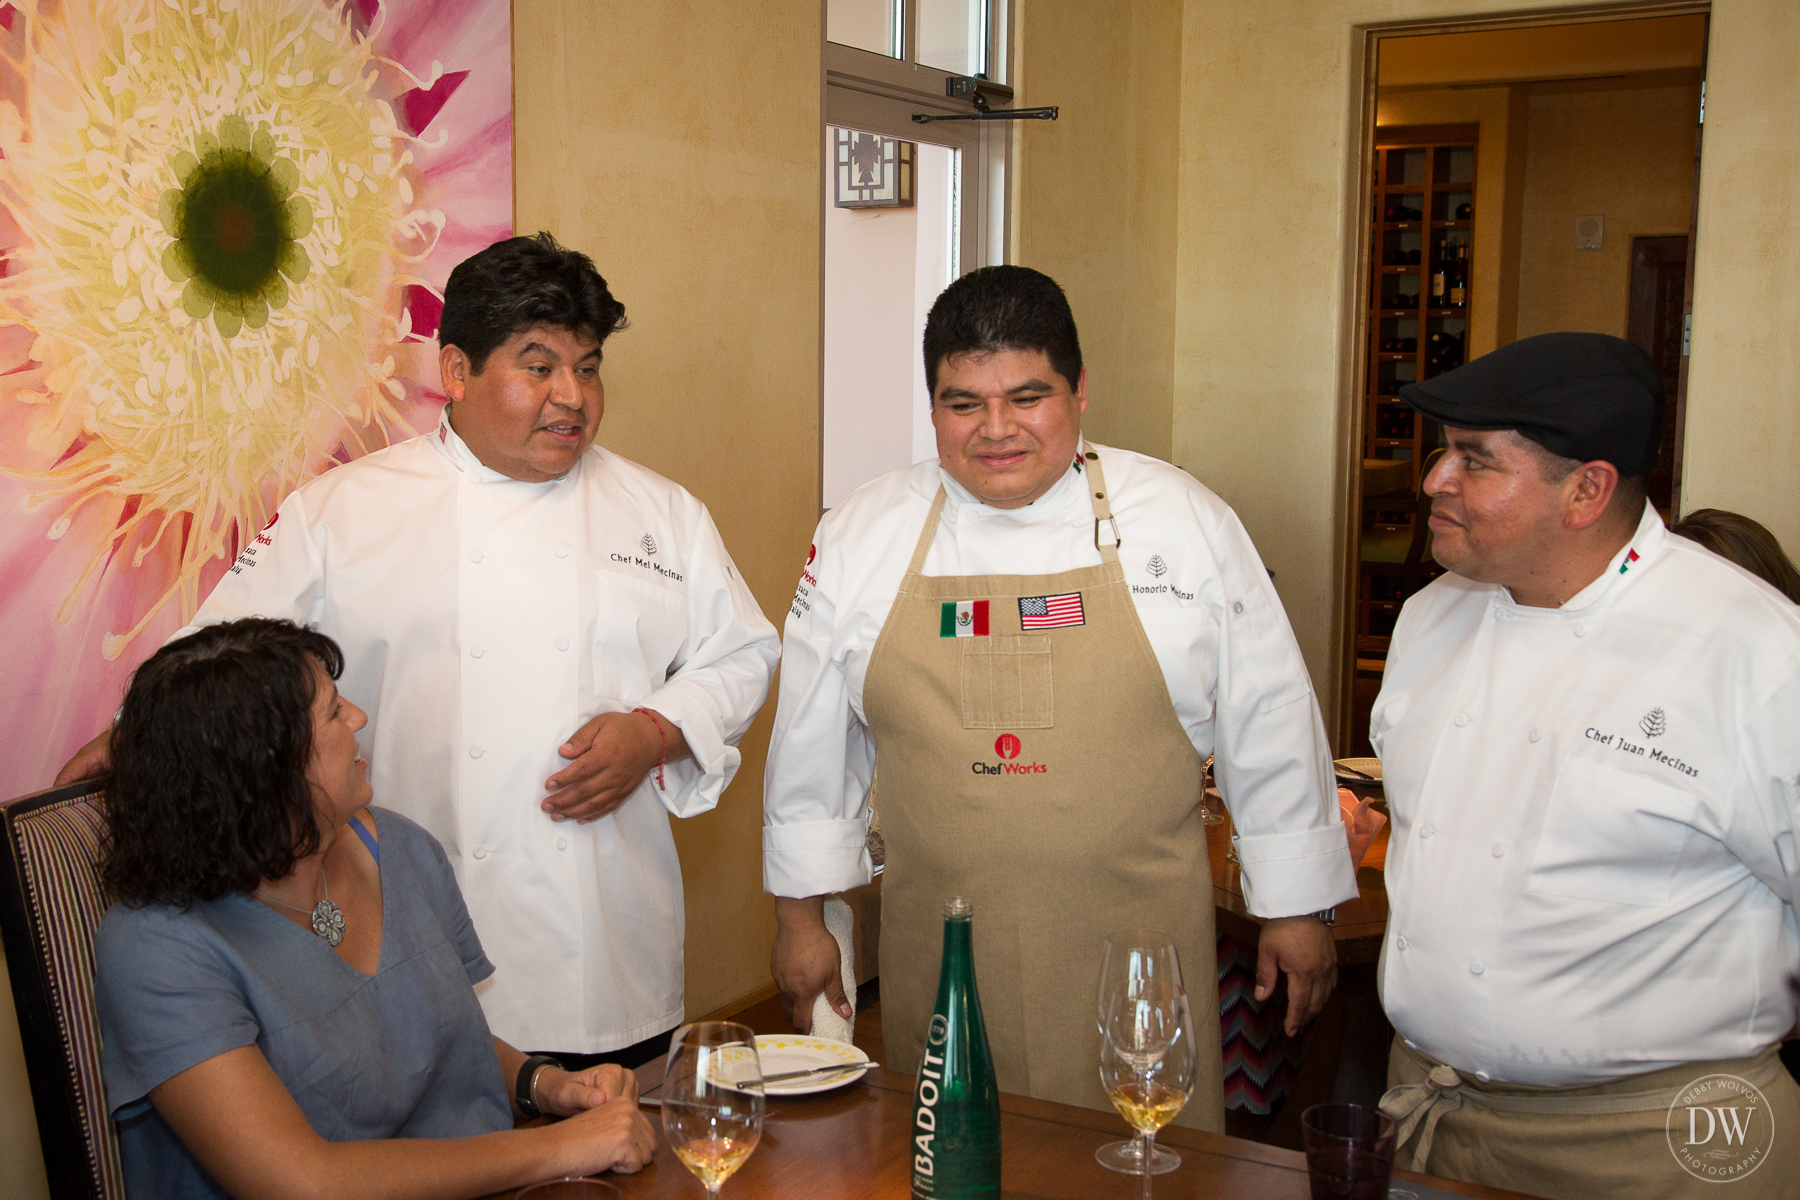 Mecinas Hispanic Mash Up low res wm Christina (35 of 92).jpg